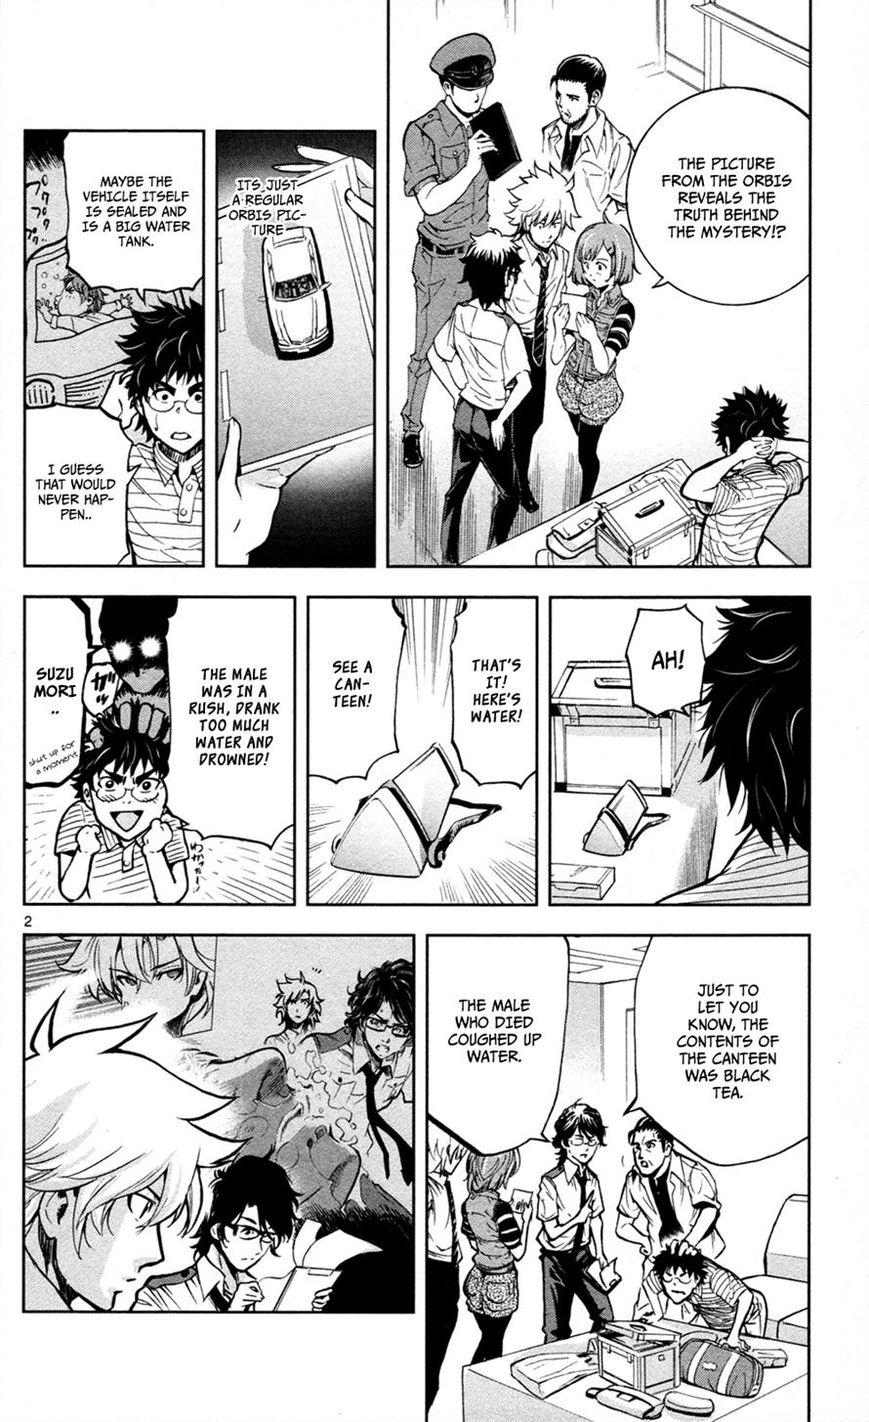 Chousuinou Kei - Makafushigi Jiken File 12 Page 2